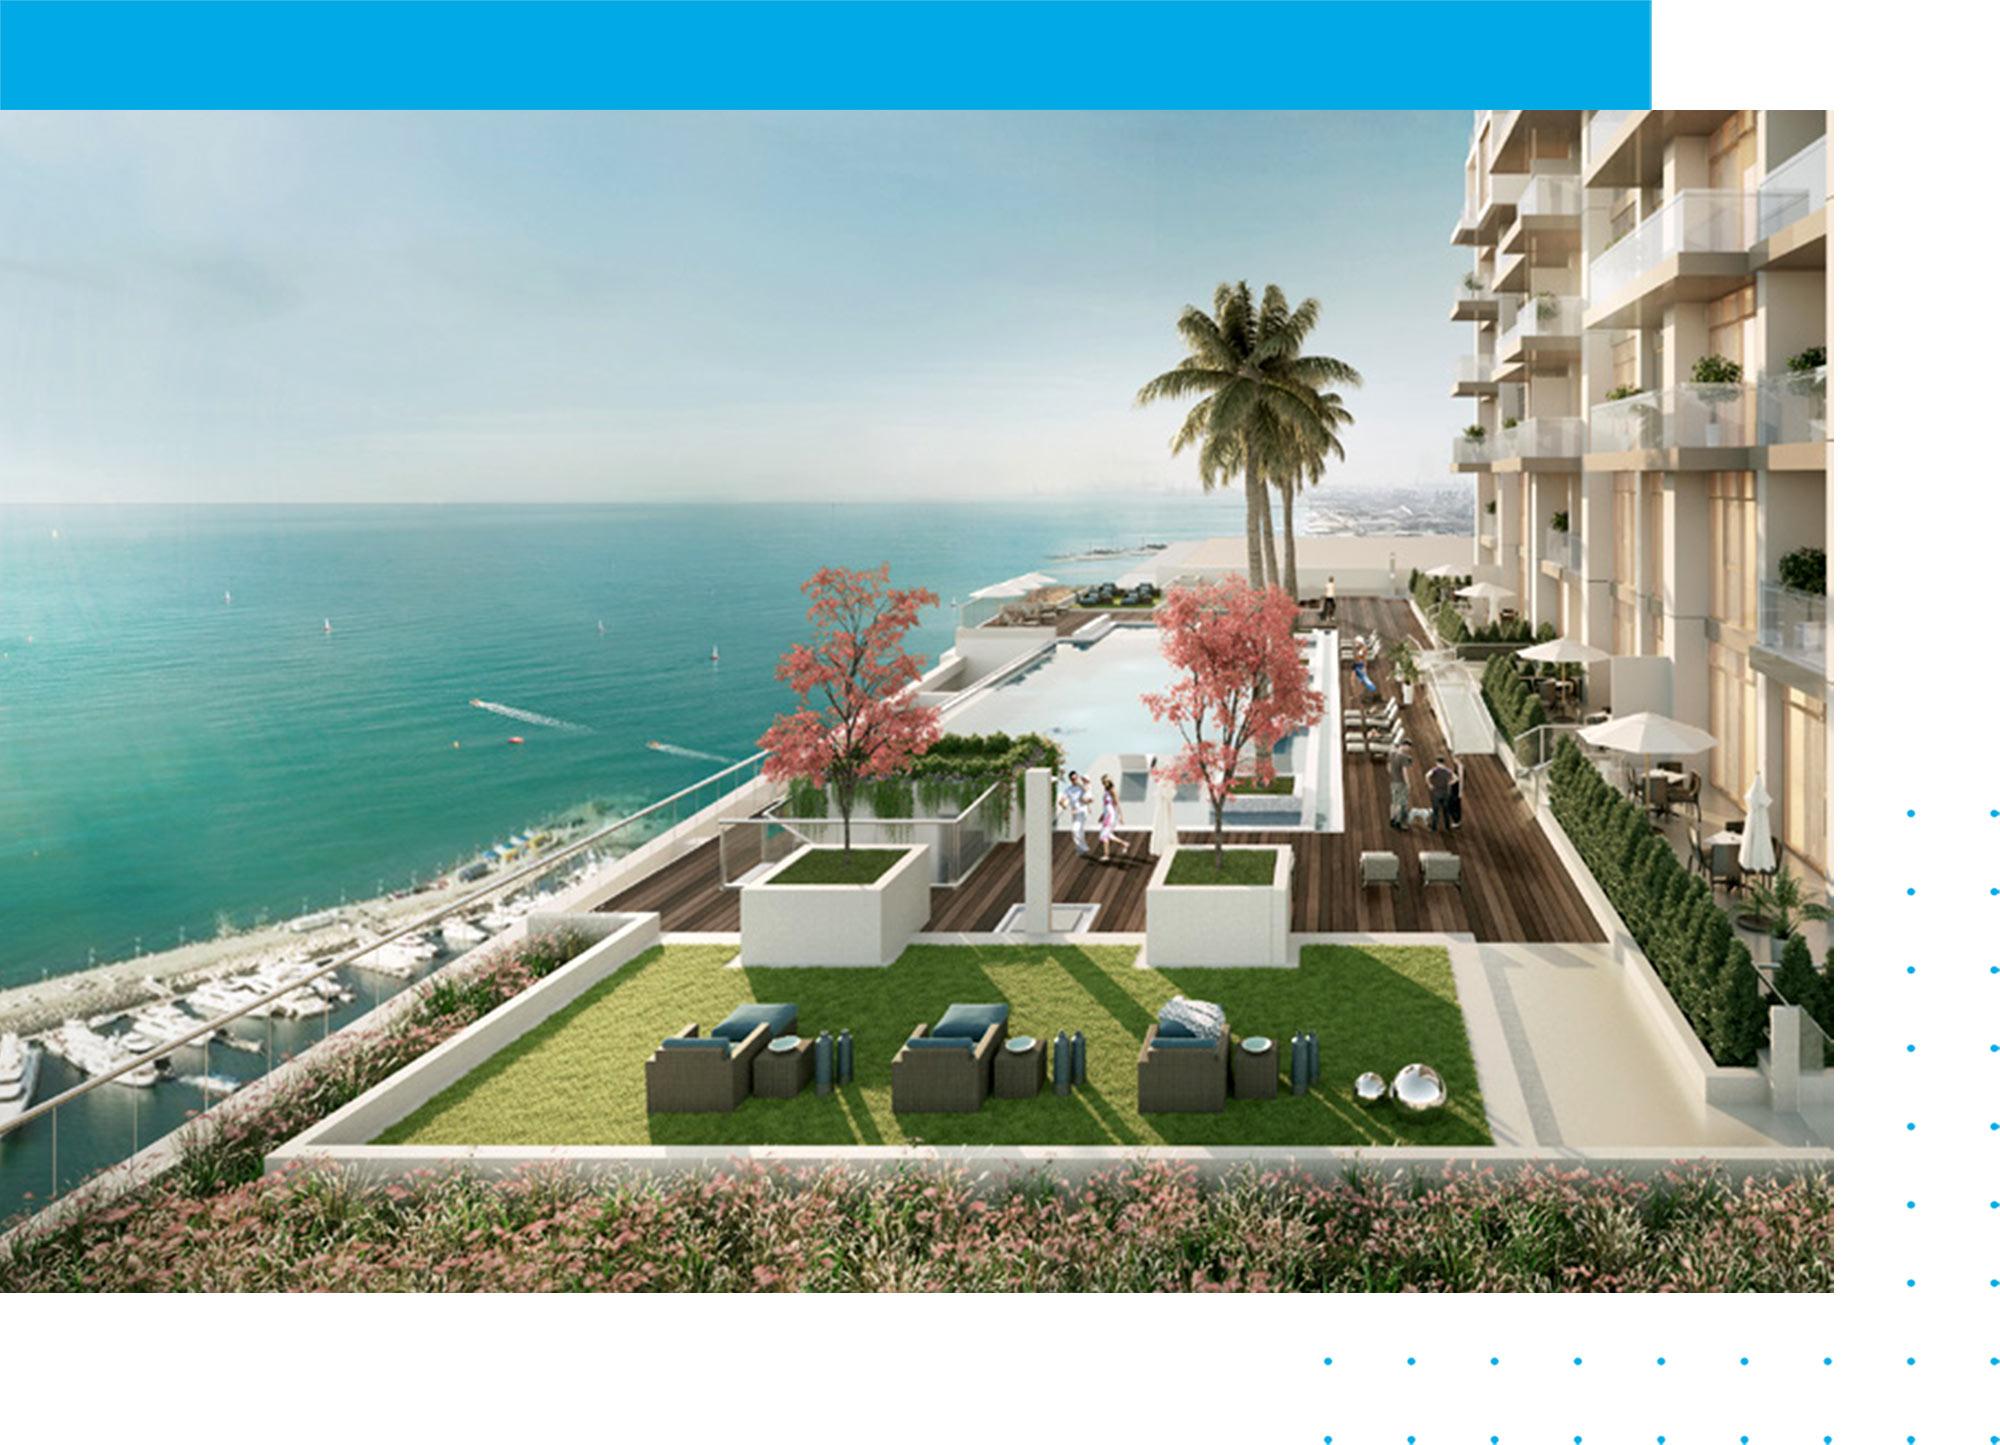 Omniyat Anwa – Apartments for Sale in Dubai Maritime City